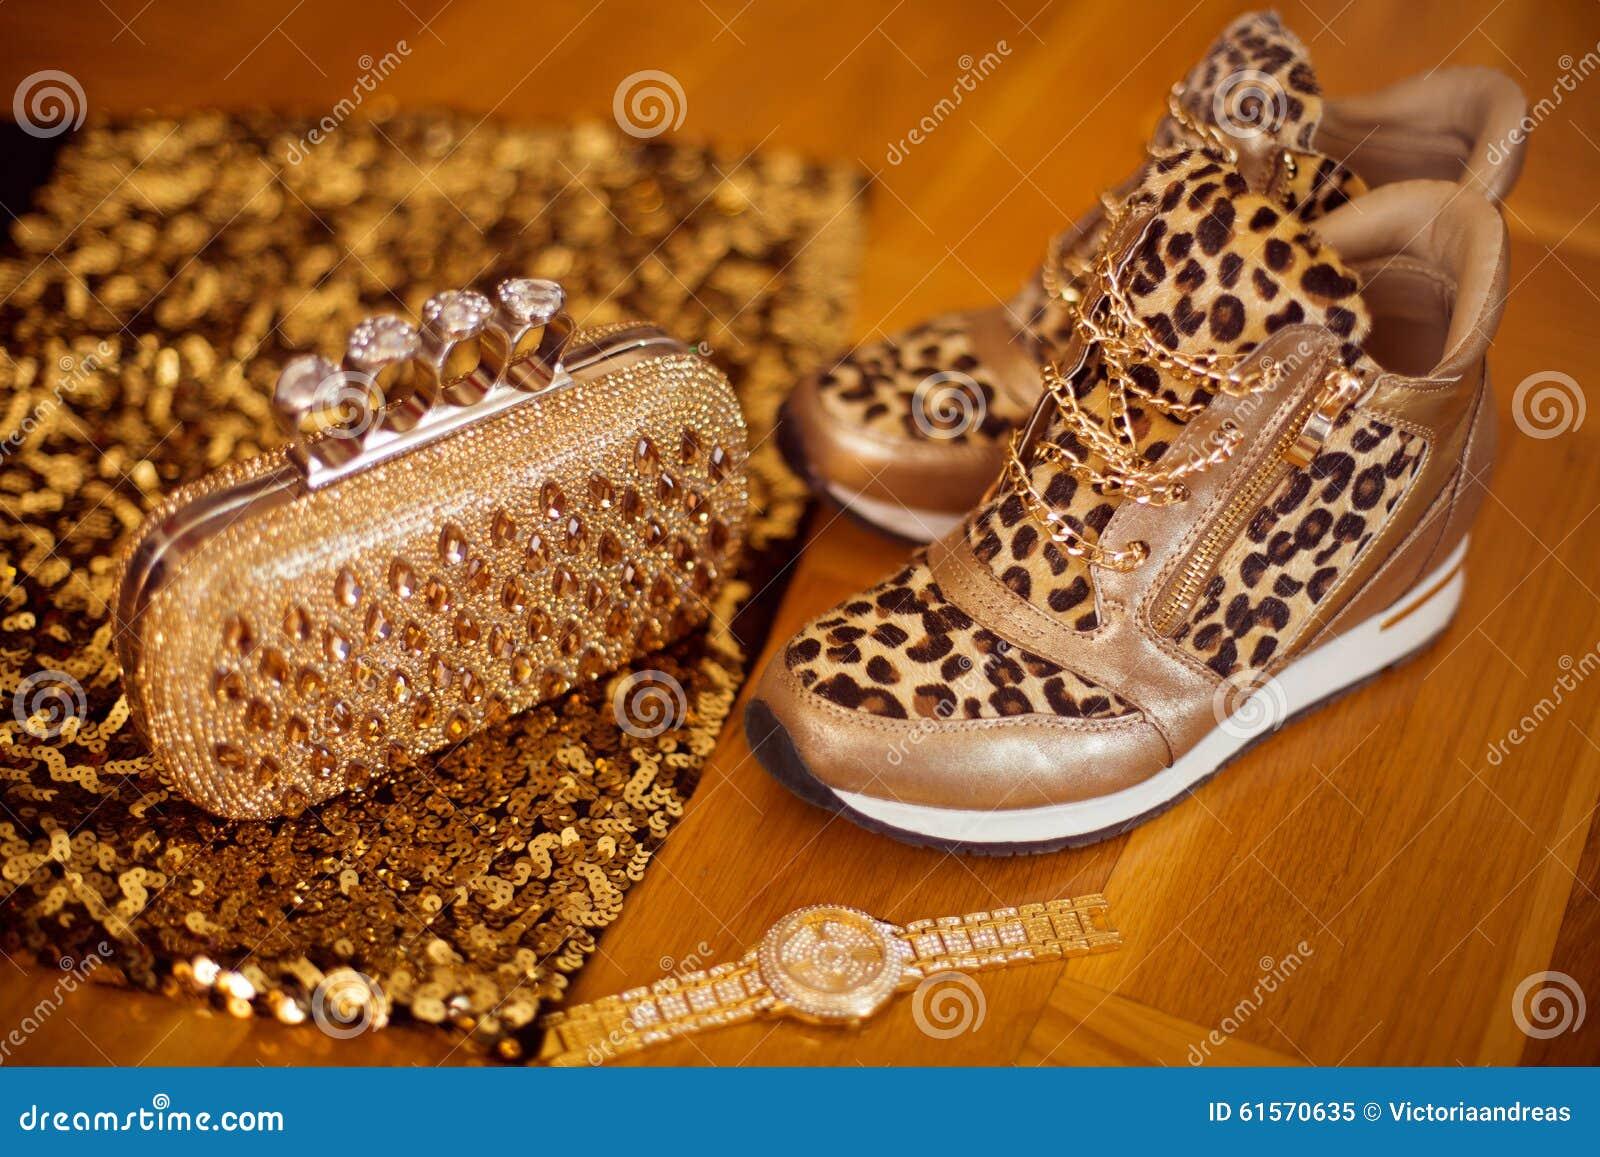 1035a1a9bc6 Πάνινα παπούτσια λεοπαρδάλεων μόδας με Wristwatch και το πορτοφόλι ...